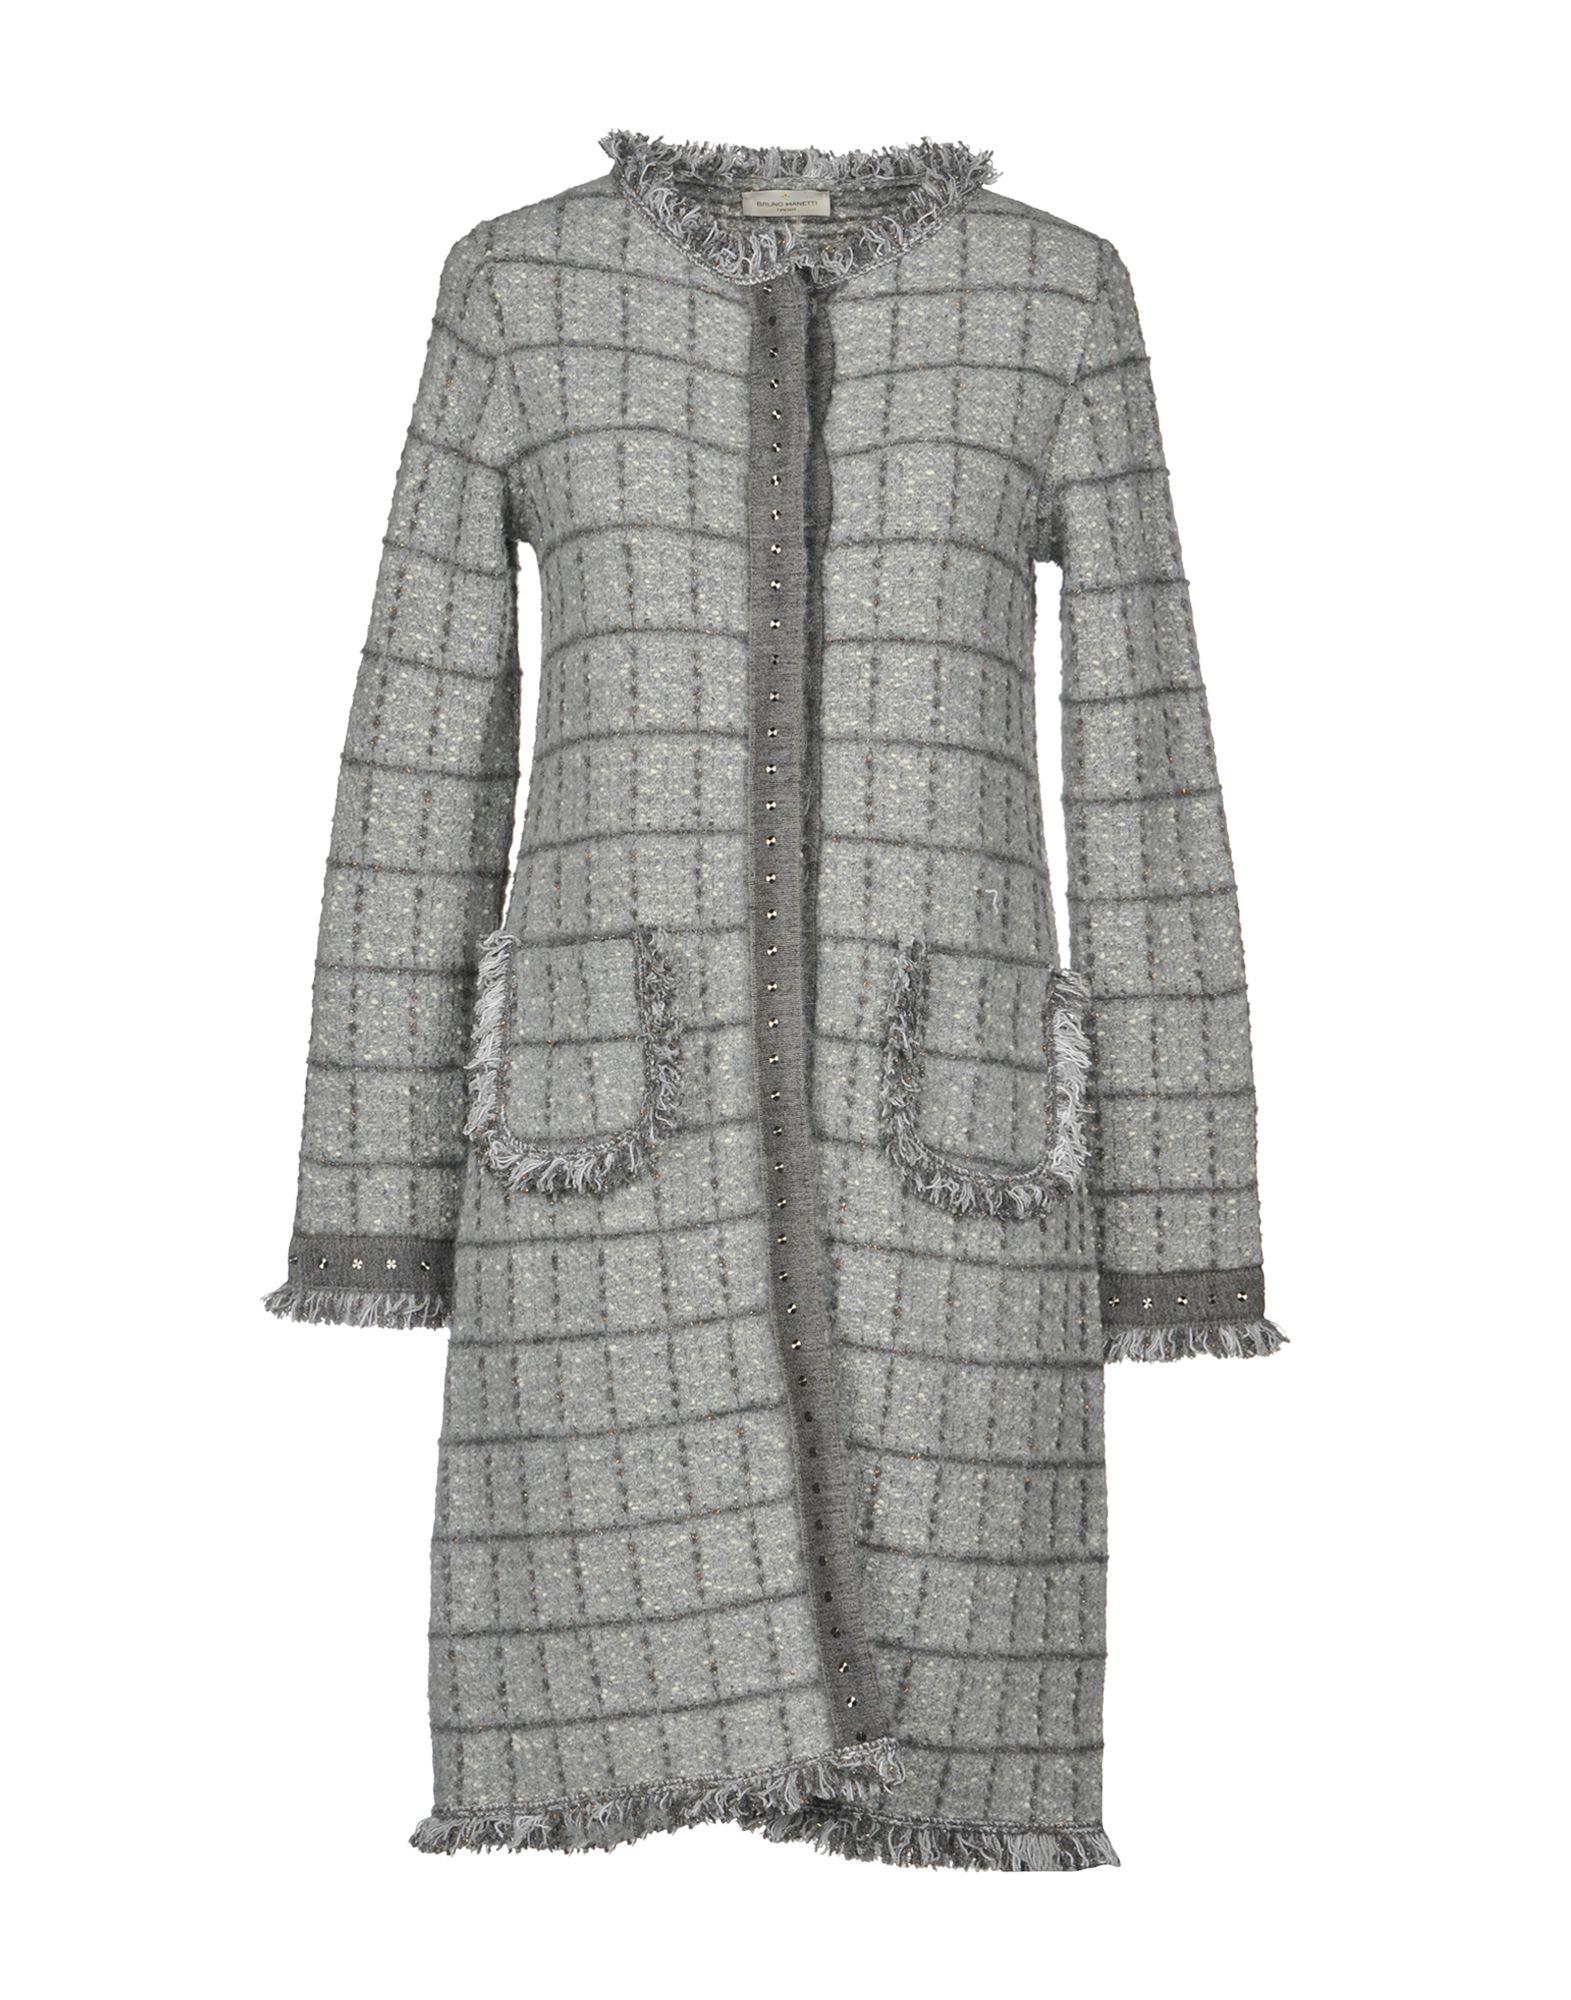 BRUNO MANETTI Full-Length Jacket in Grey